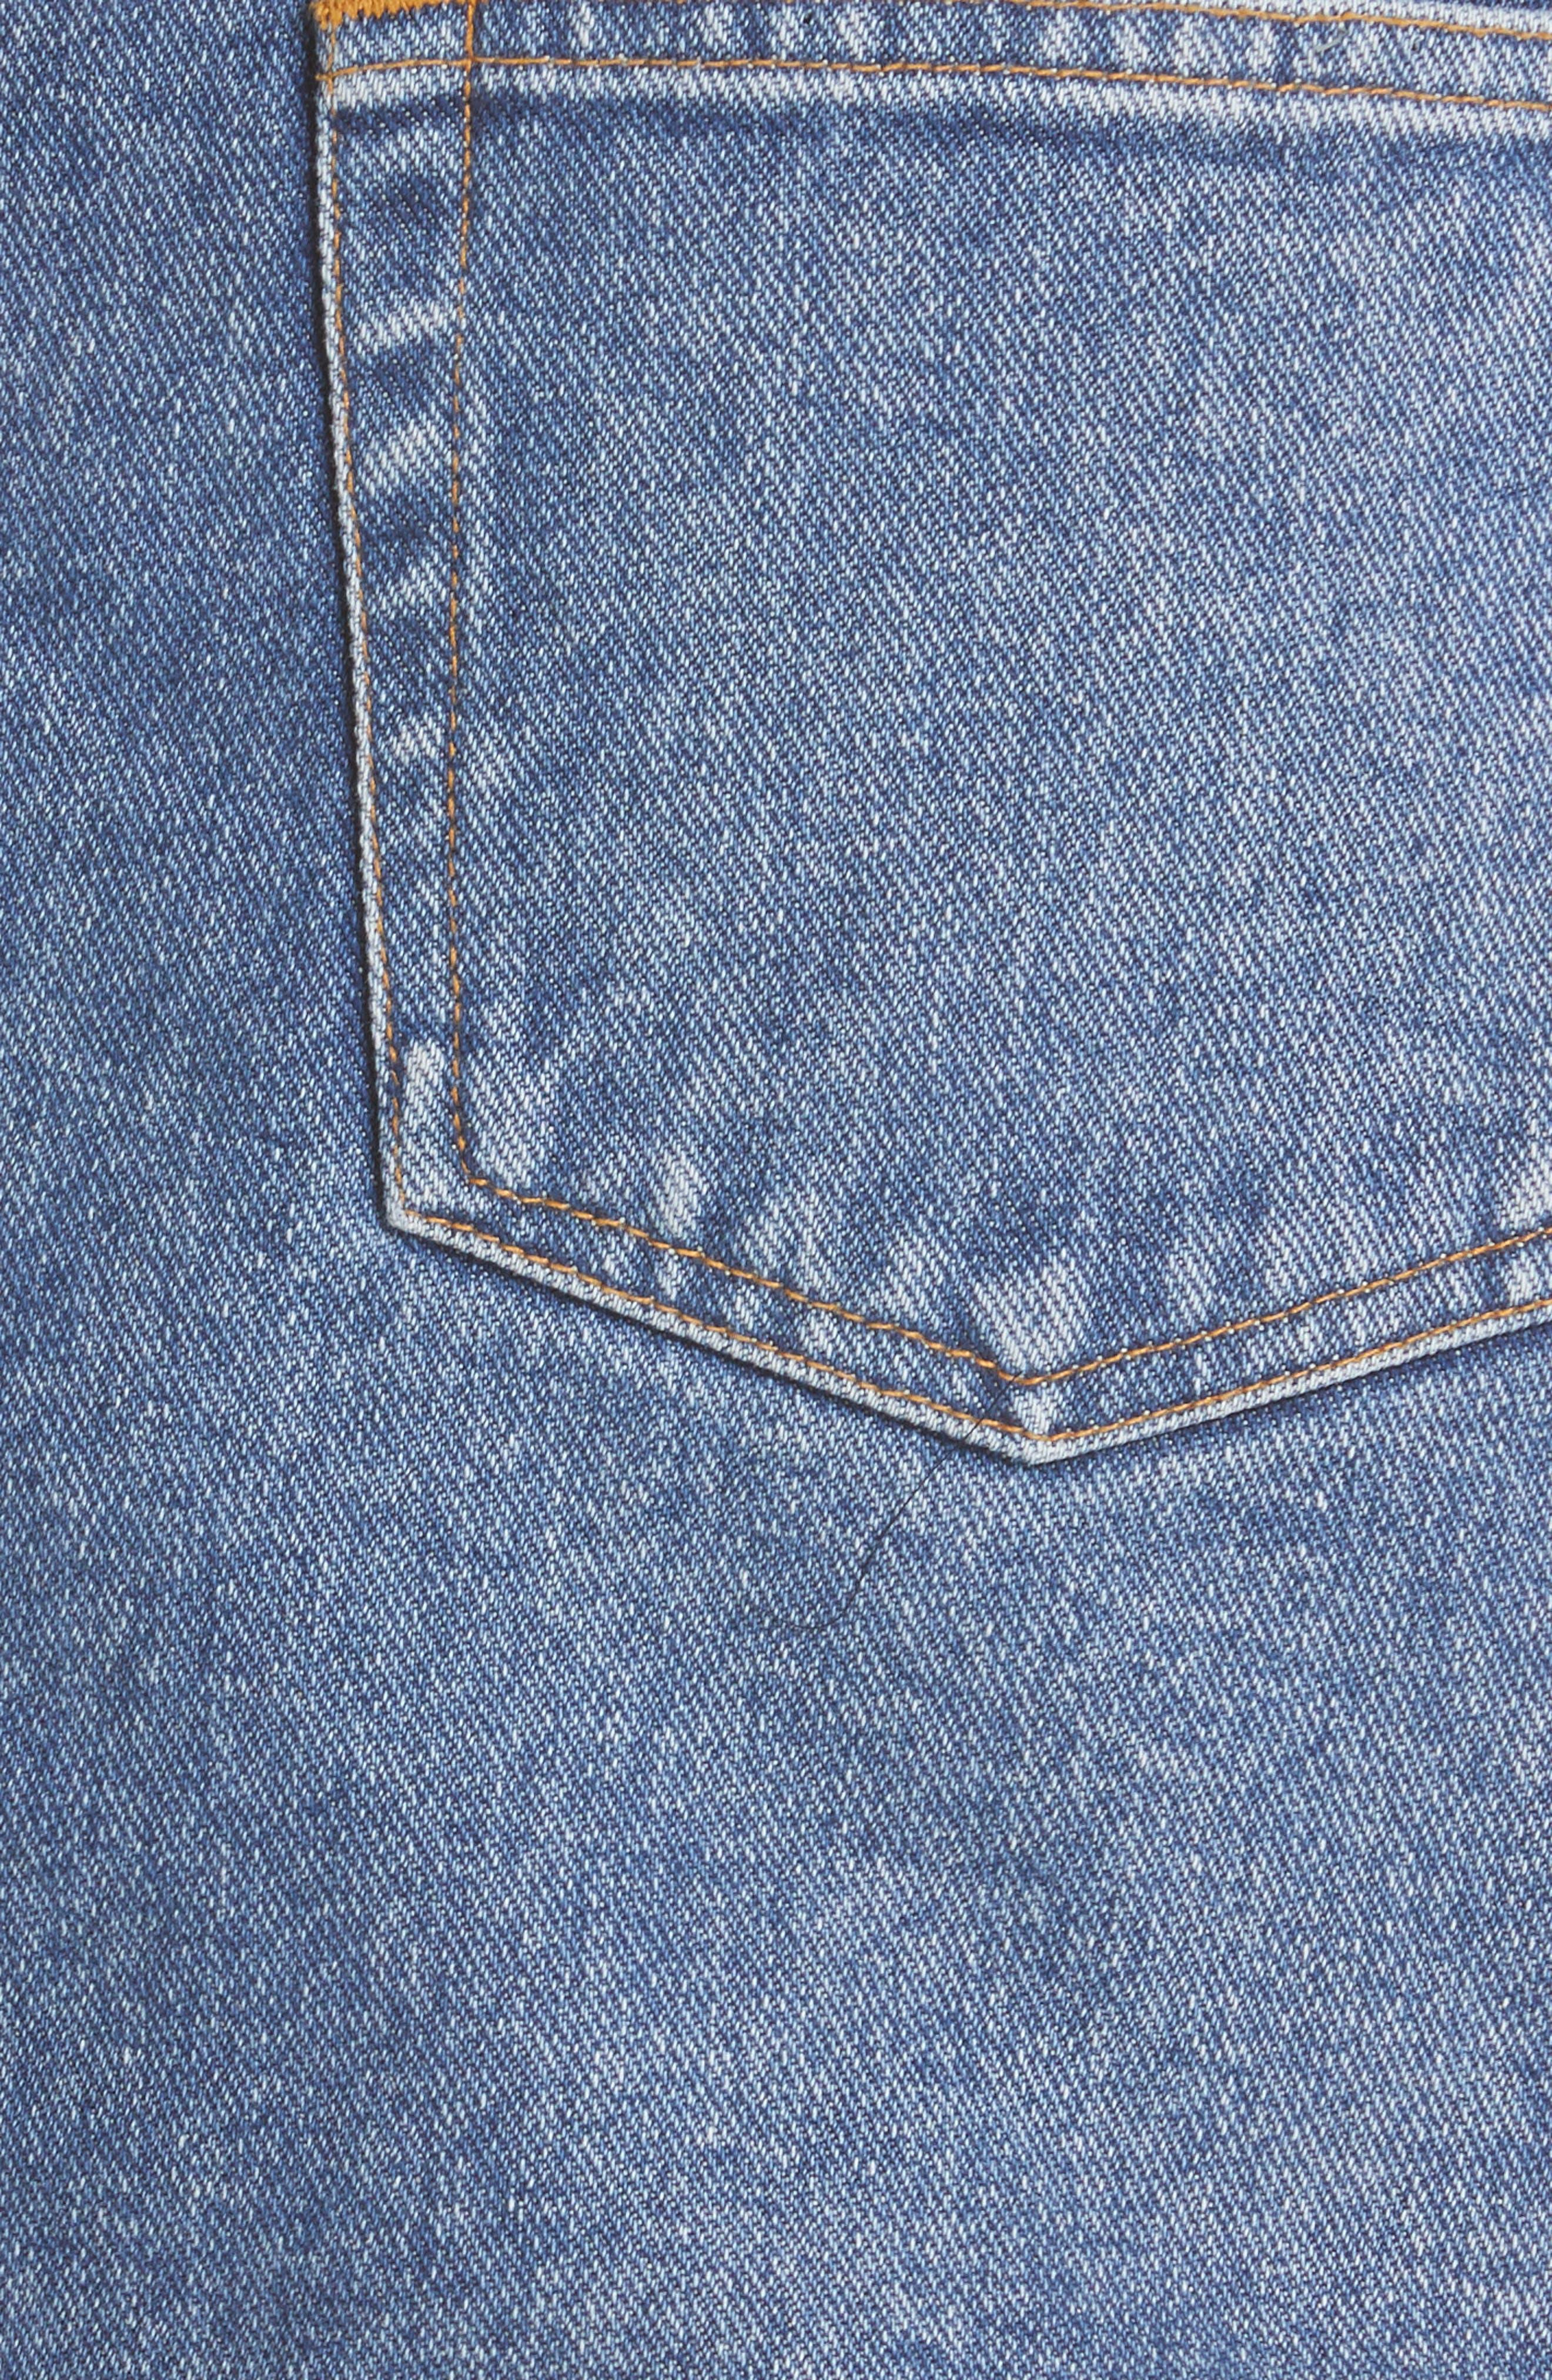 ,                             Denim Miniskirt,                             Alternate thumbnail 5, color,                             VINTAGE WASH 4